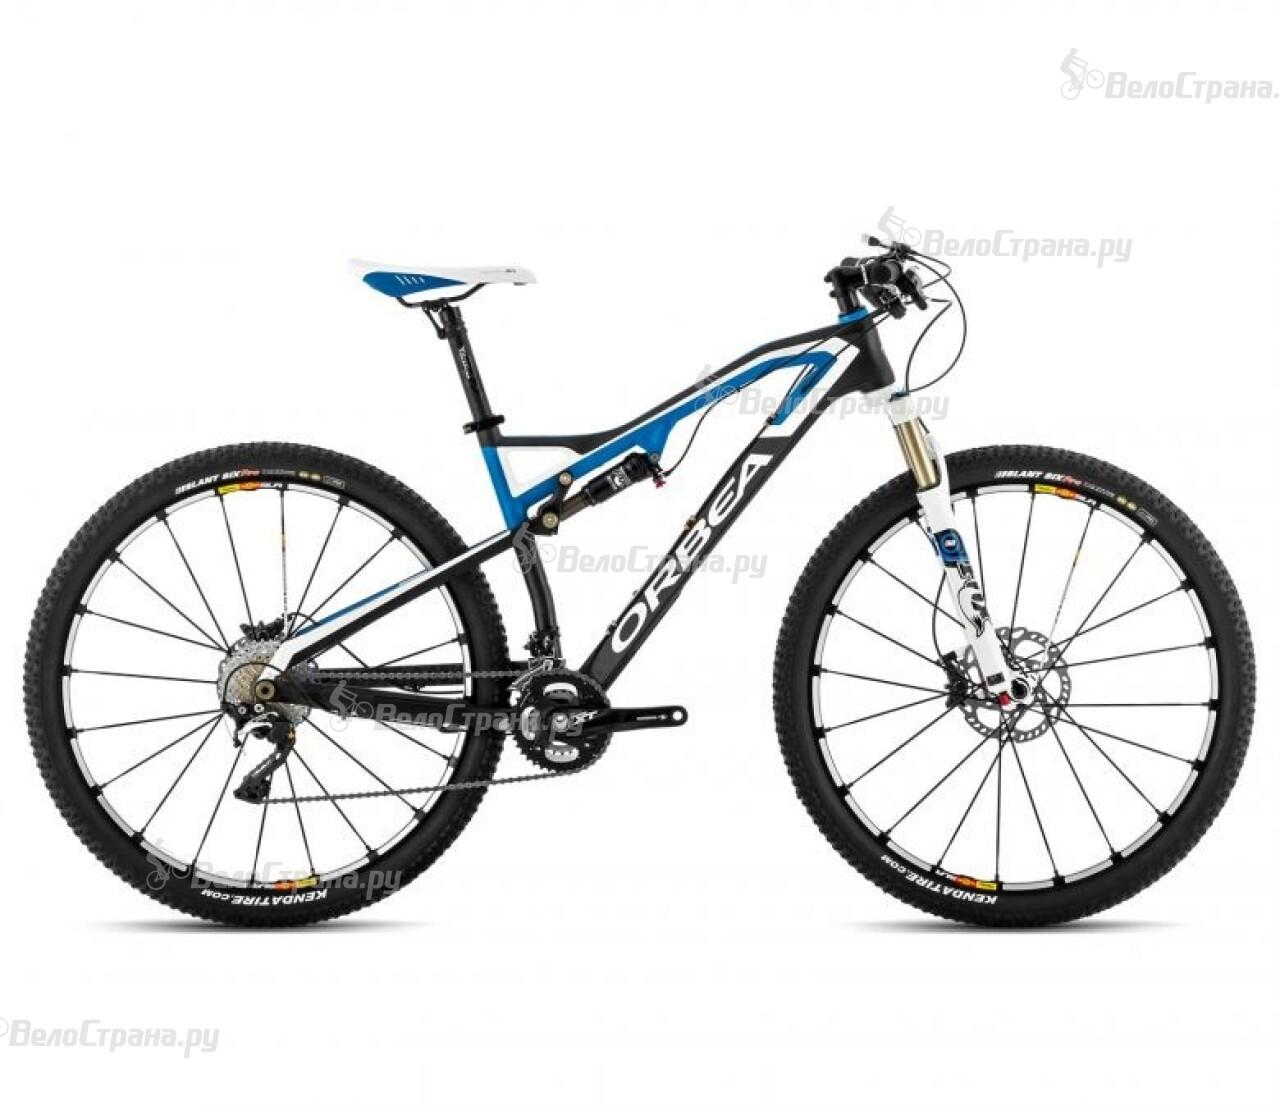 Велосипед Orbea Occam 29 M30 (2014)